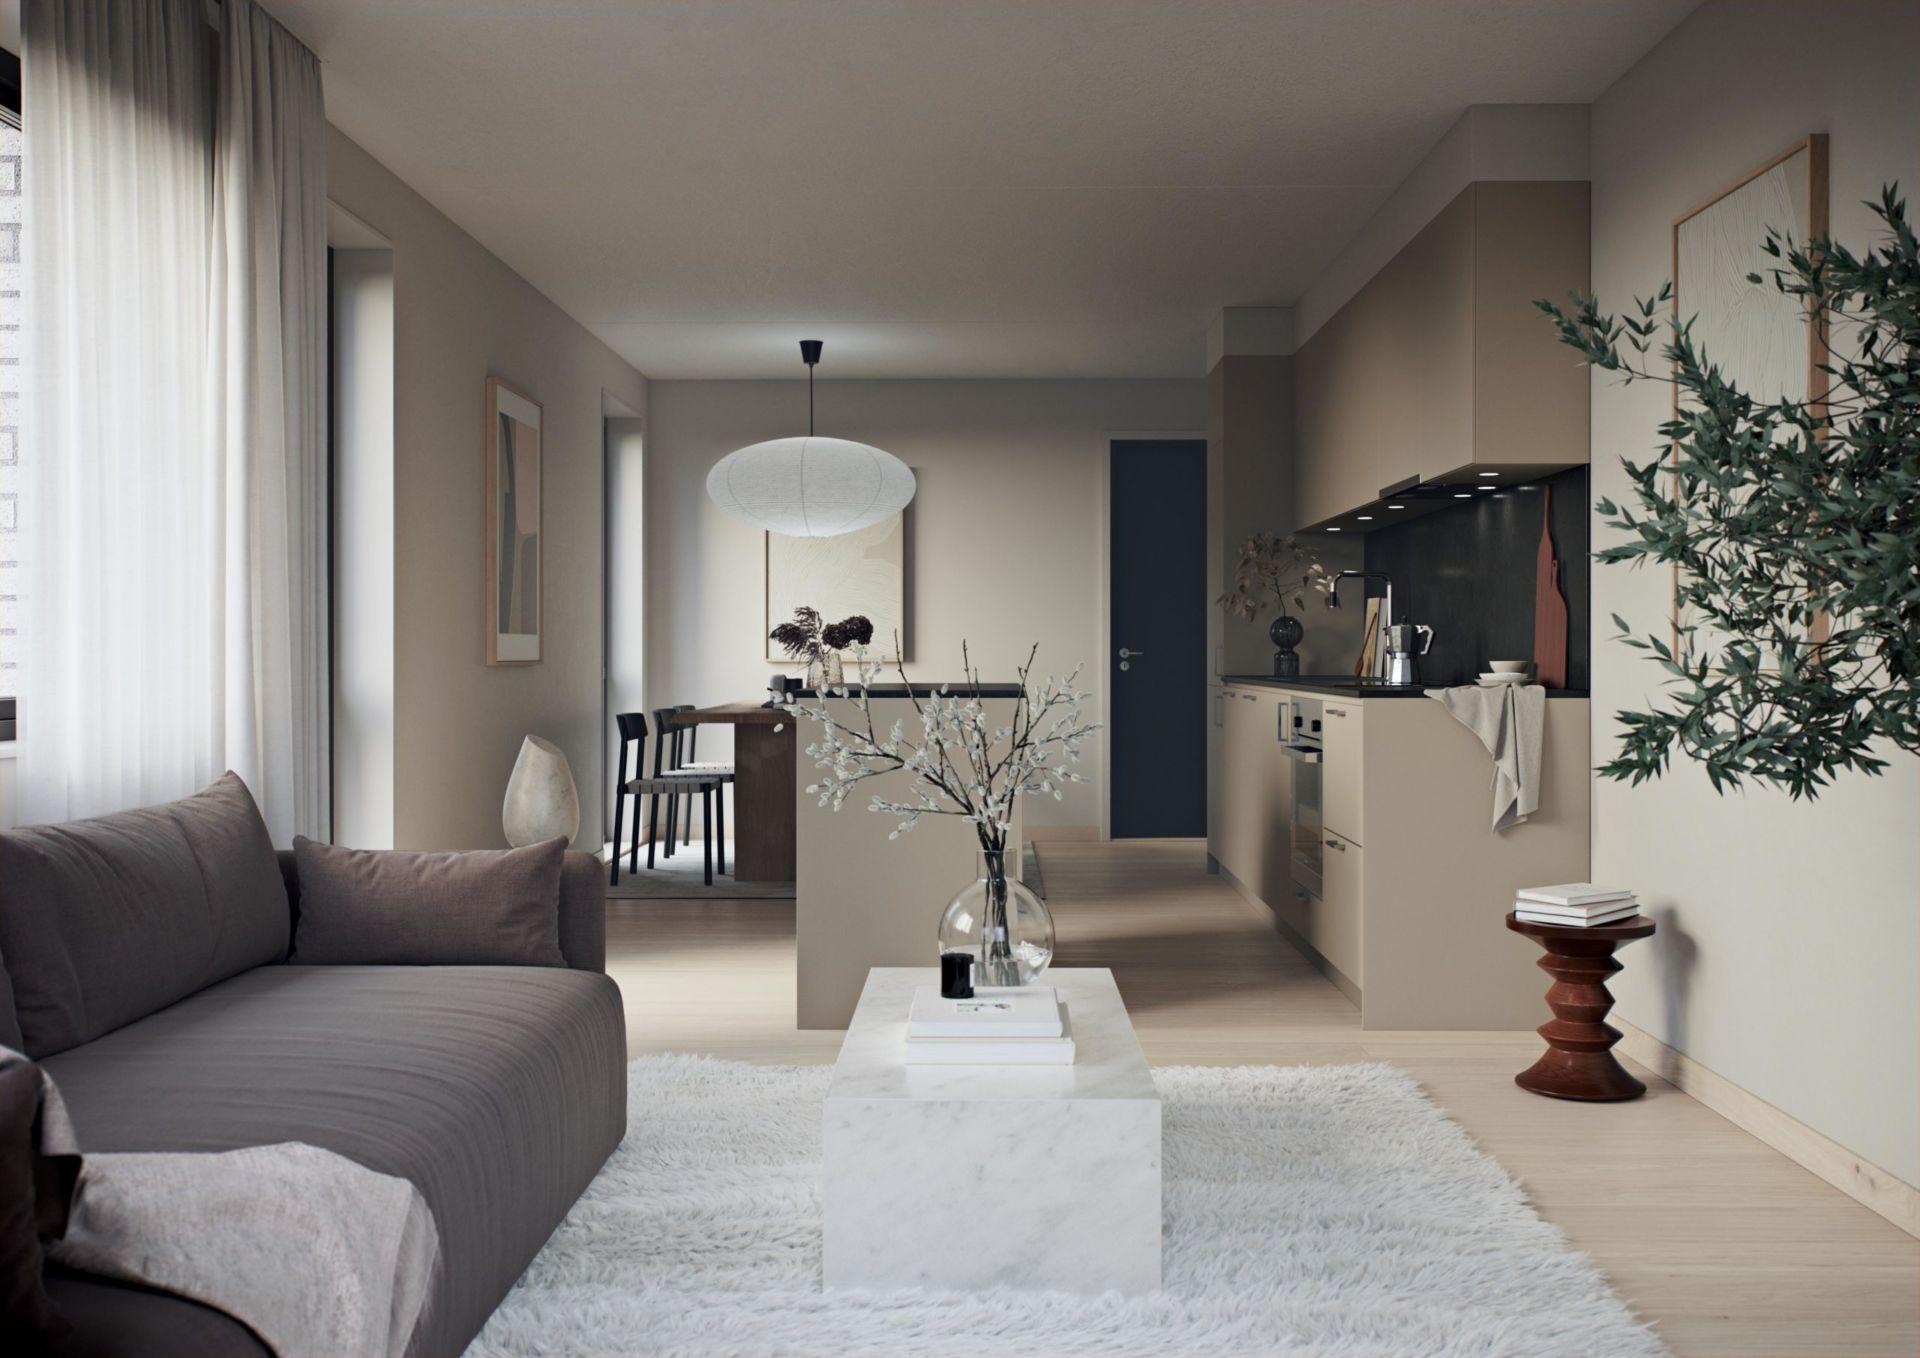 Arnljot_Gellines_vei_LA1105_Livingroom2